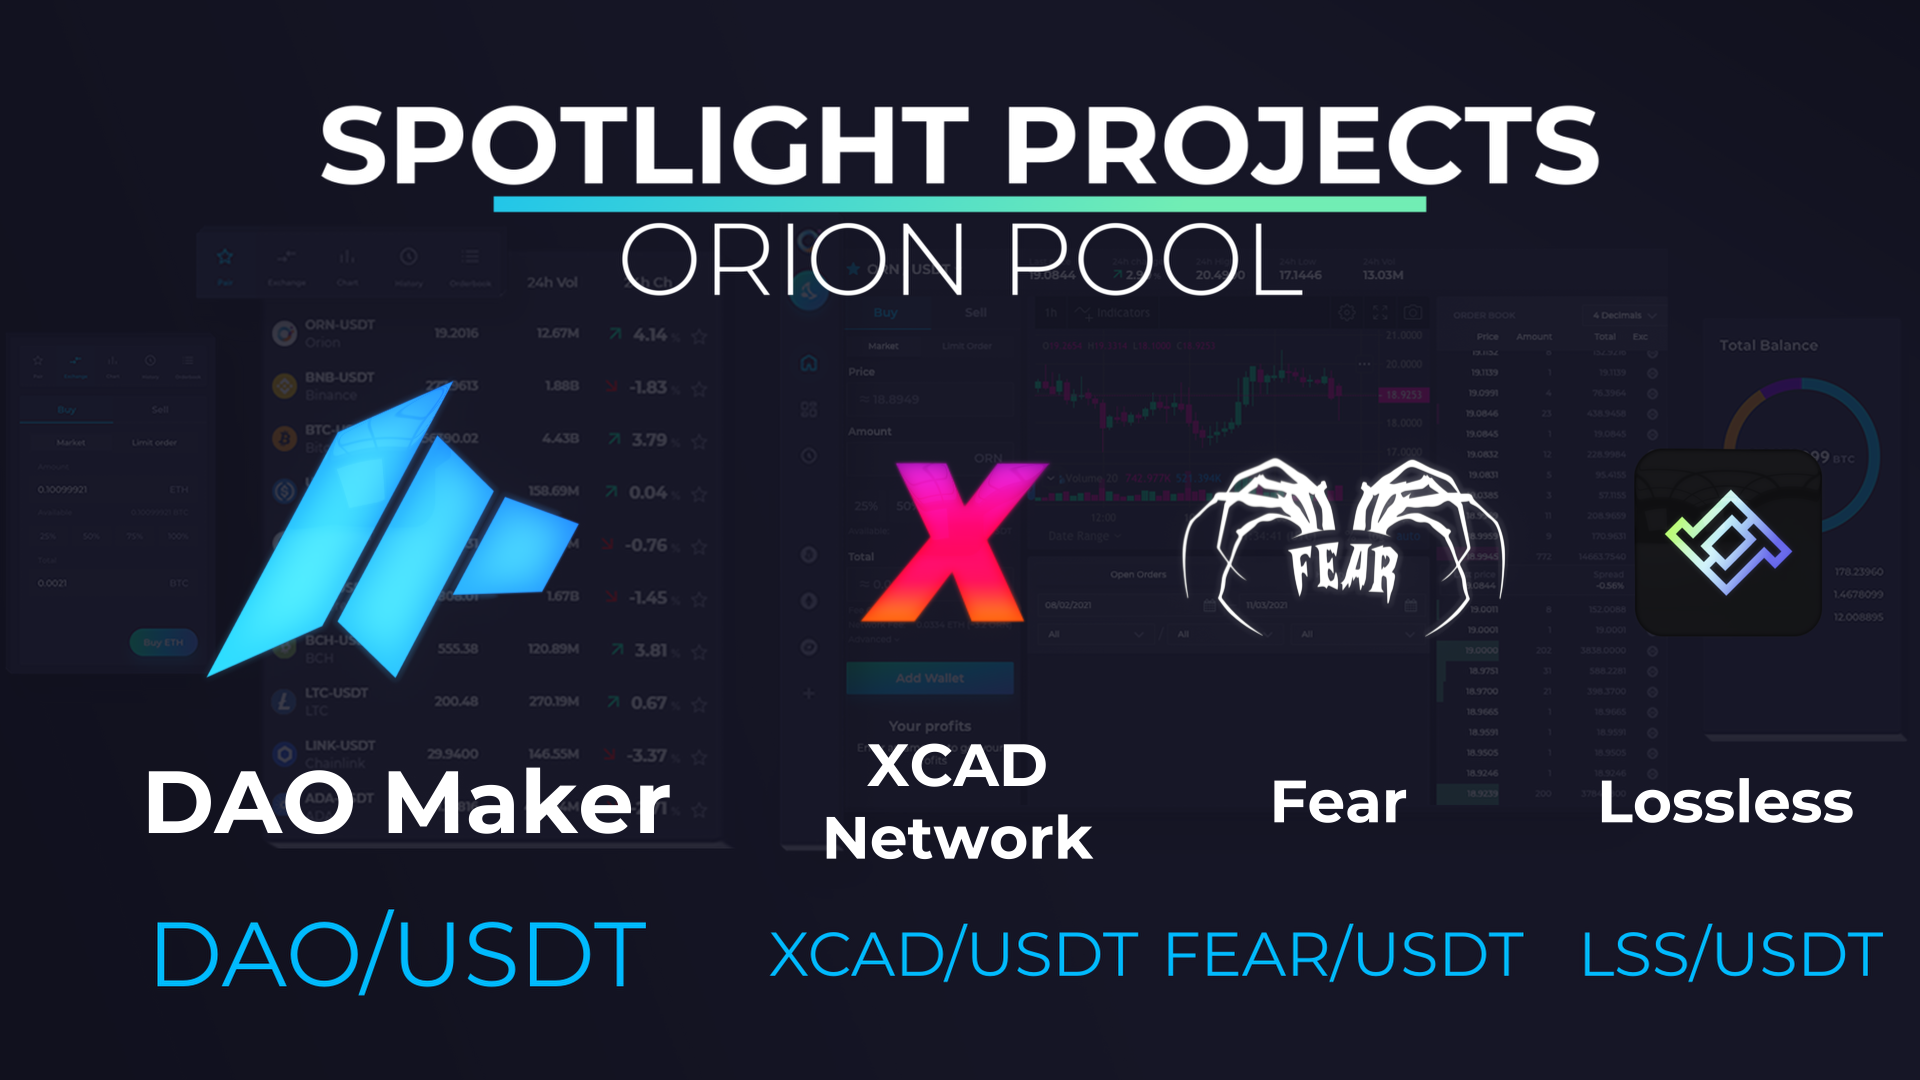 DAO Maker: Spotlight on Orion Pool